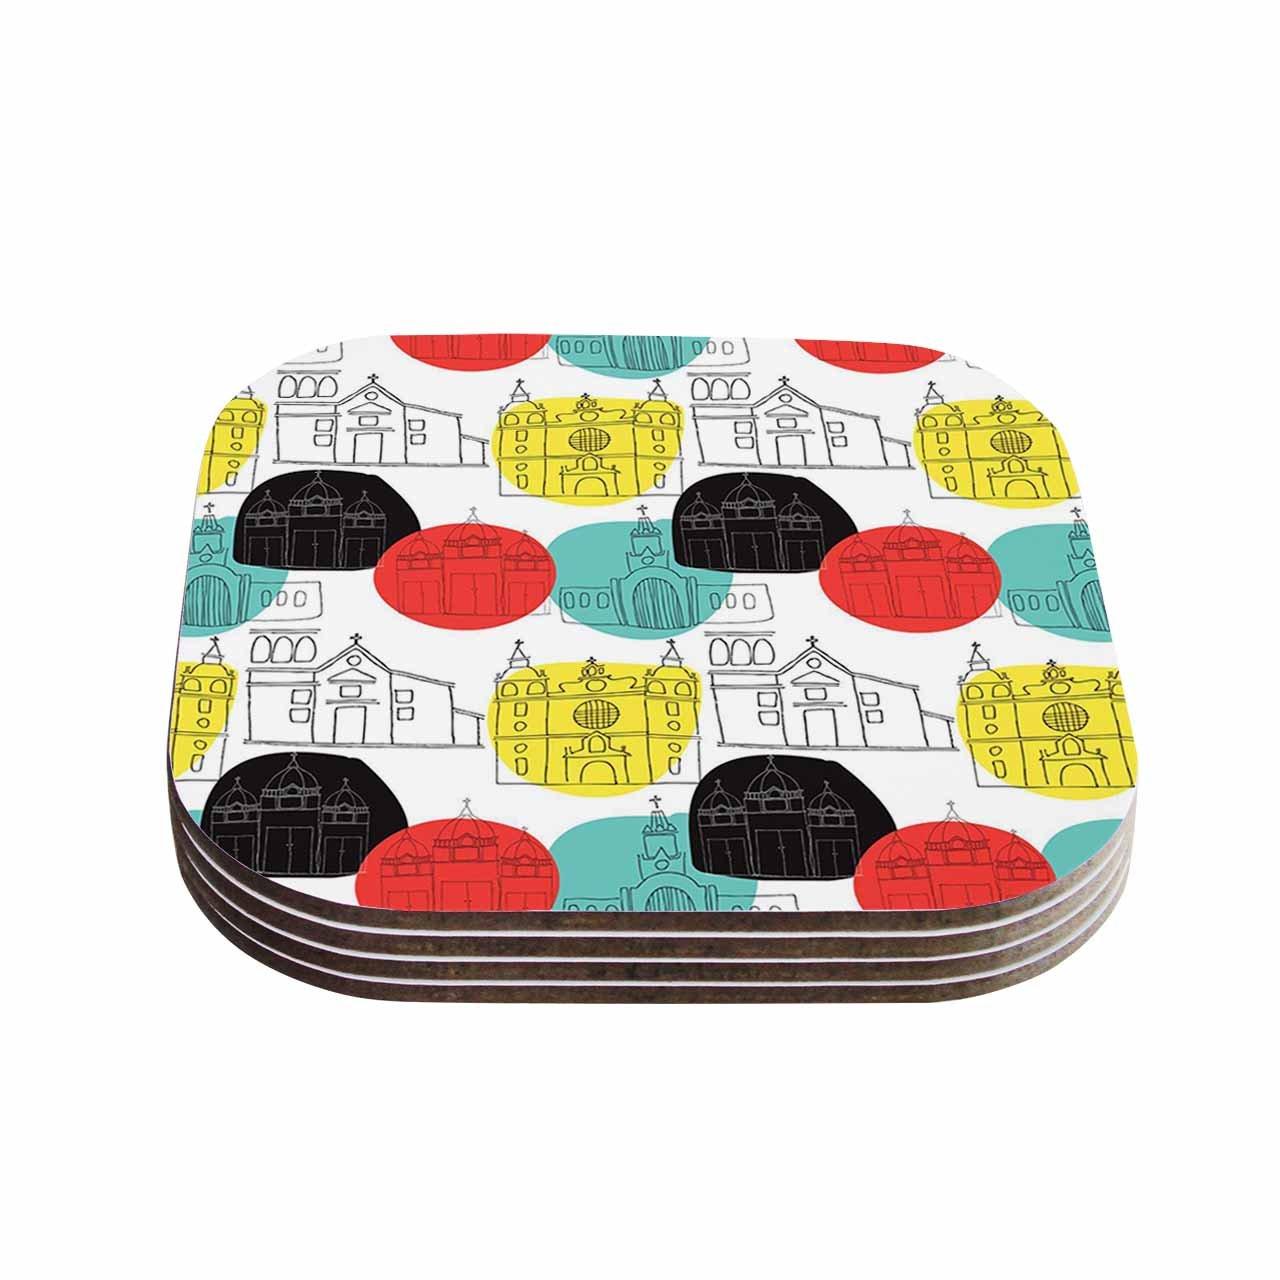 Multicolor Set of 4 KESS InHouse MaJoBVCartagena Churches Teal Red Polkadot Coasters 4 x 4